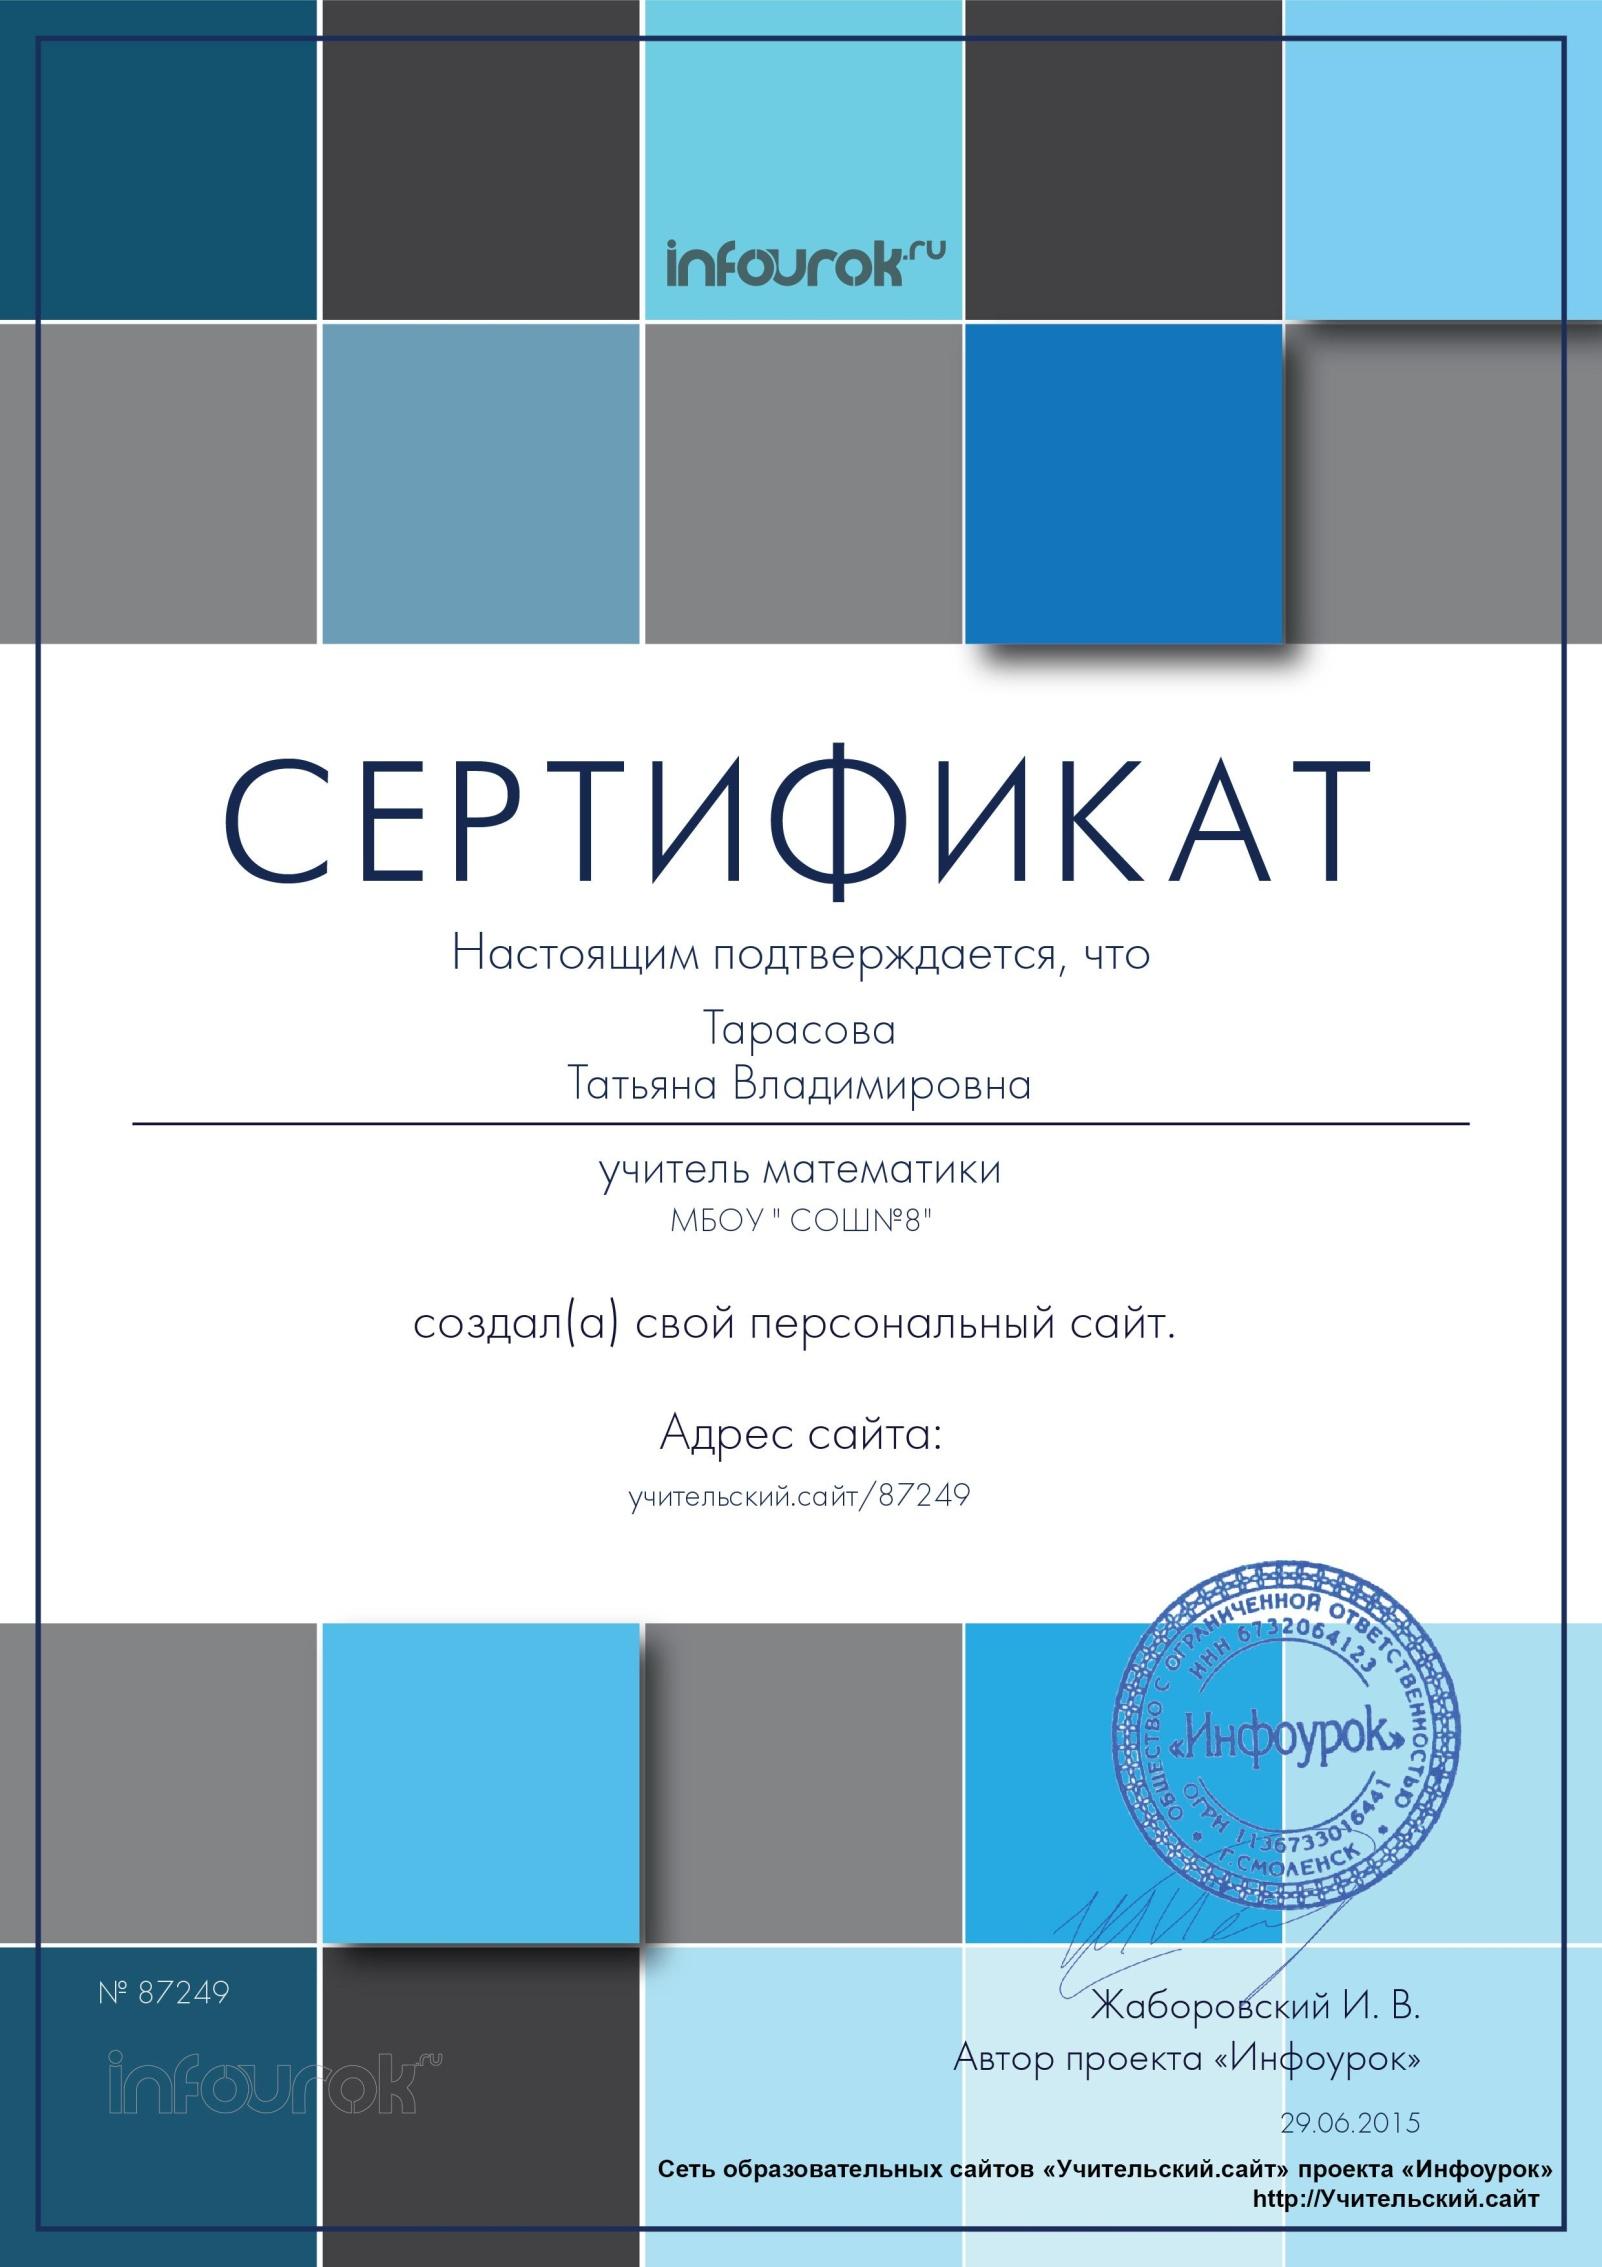 C:\Users\User\Desktop\диплом\Сертификат проекта infourok.ru № 87249.jpg